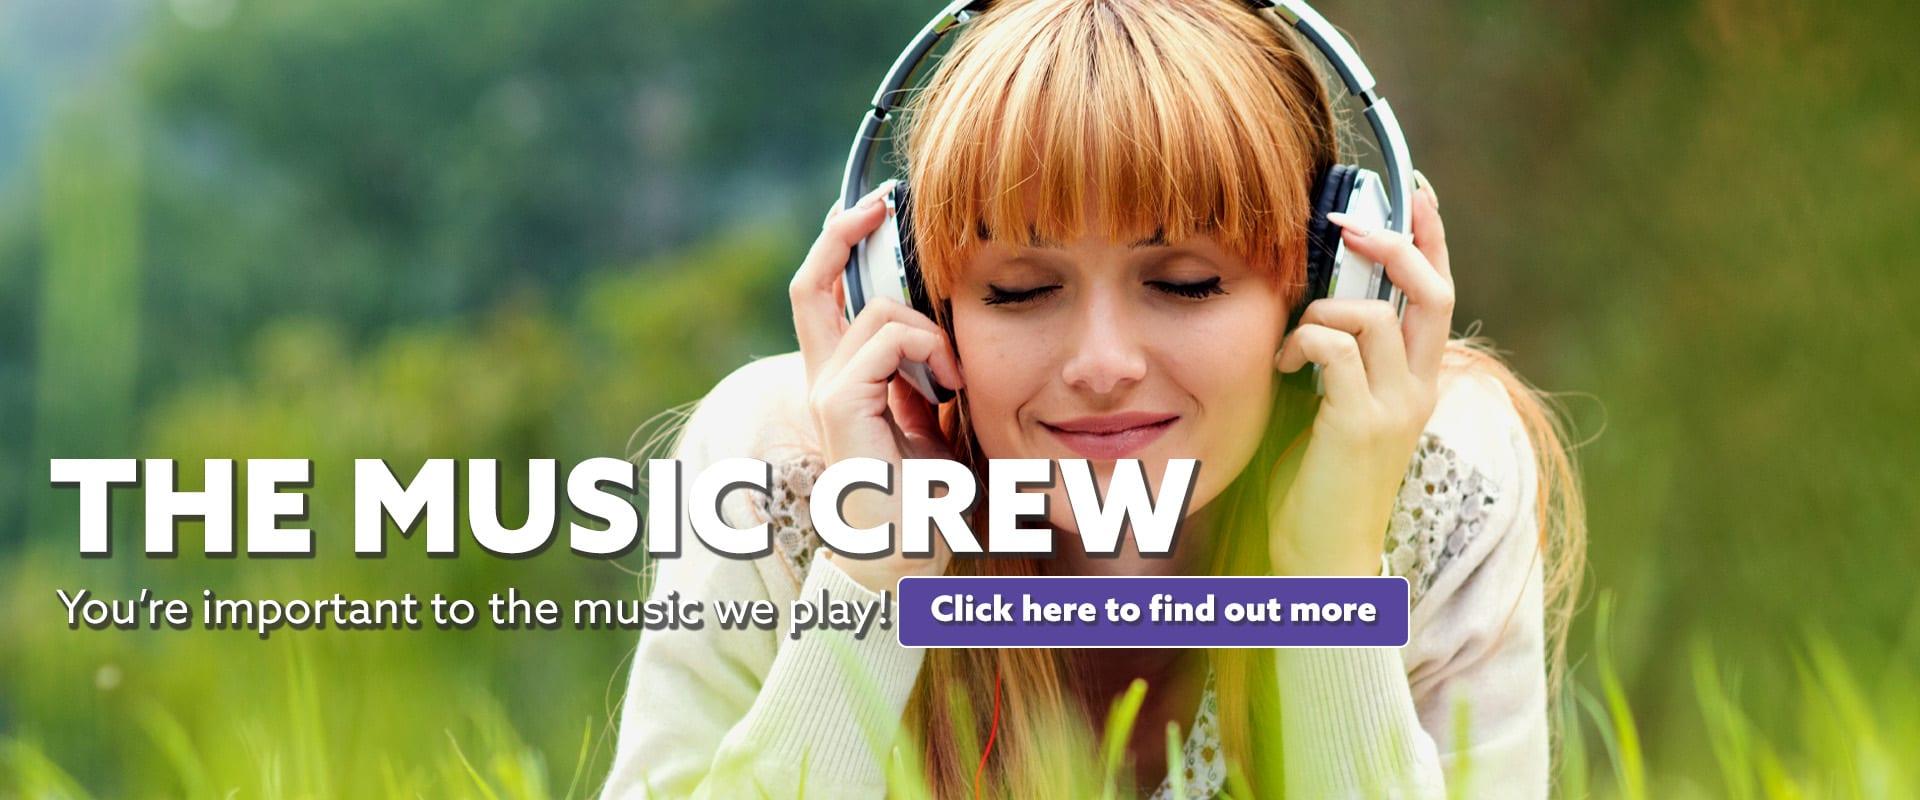 The-Music-Crew-Lift